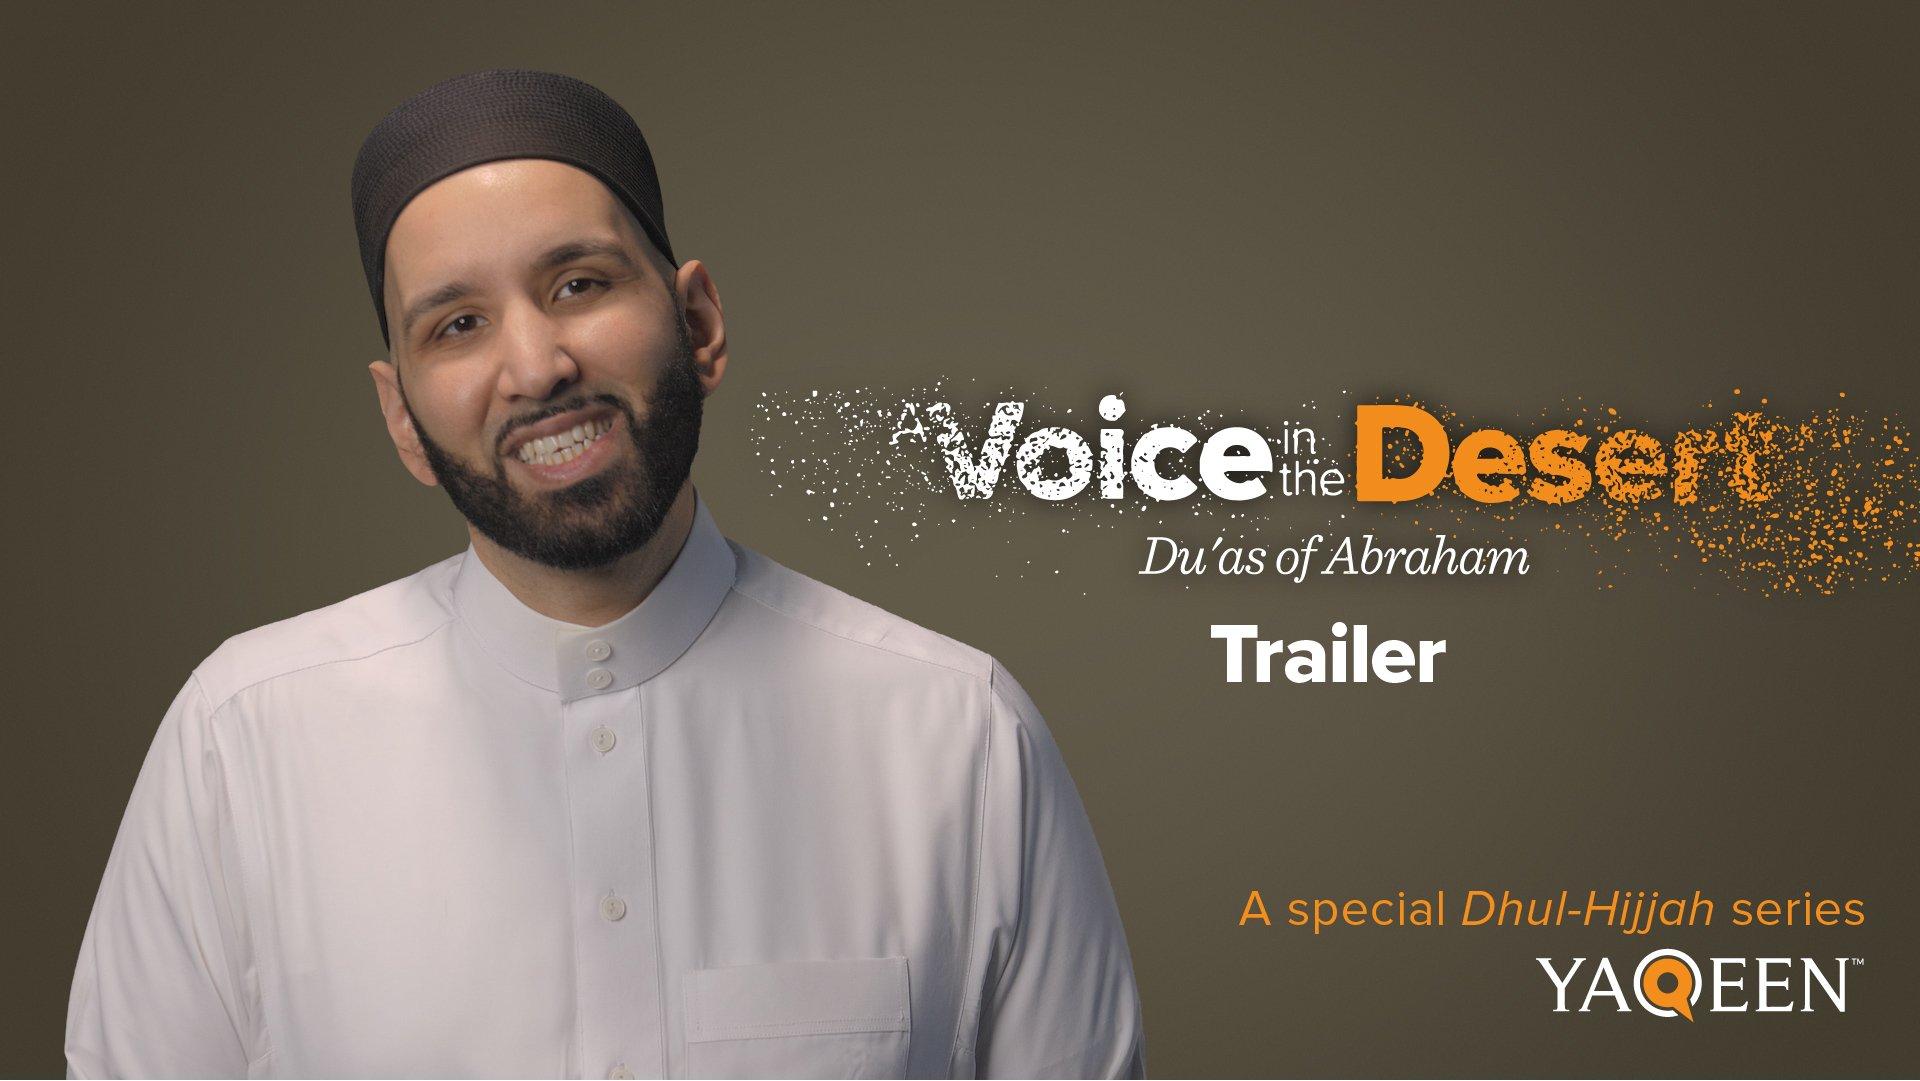 Yaqeen Presents a New Dhul Hijjah Series!